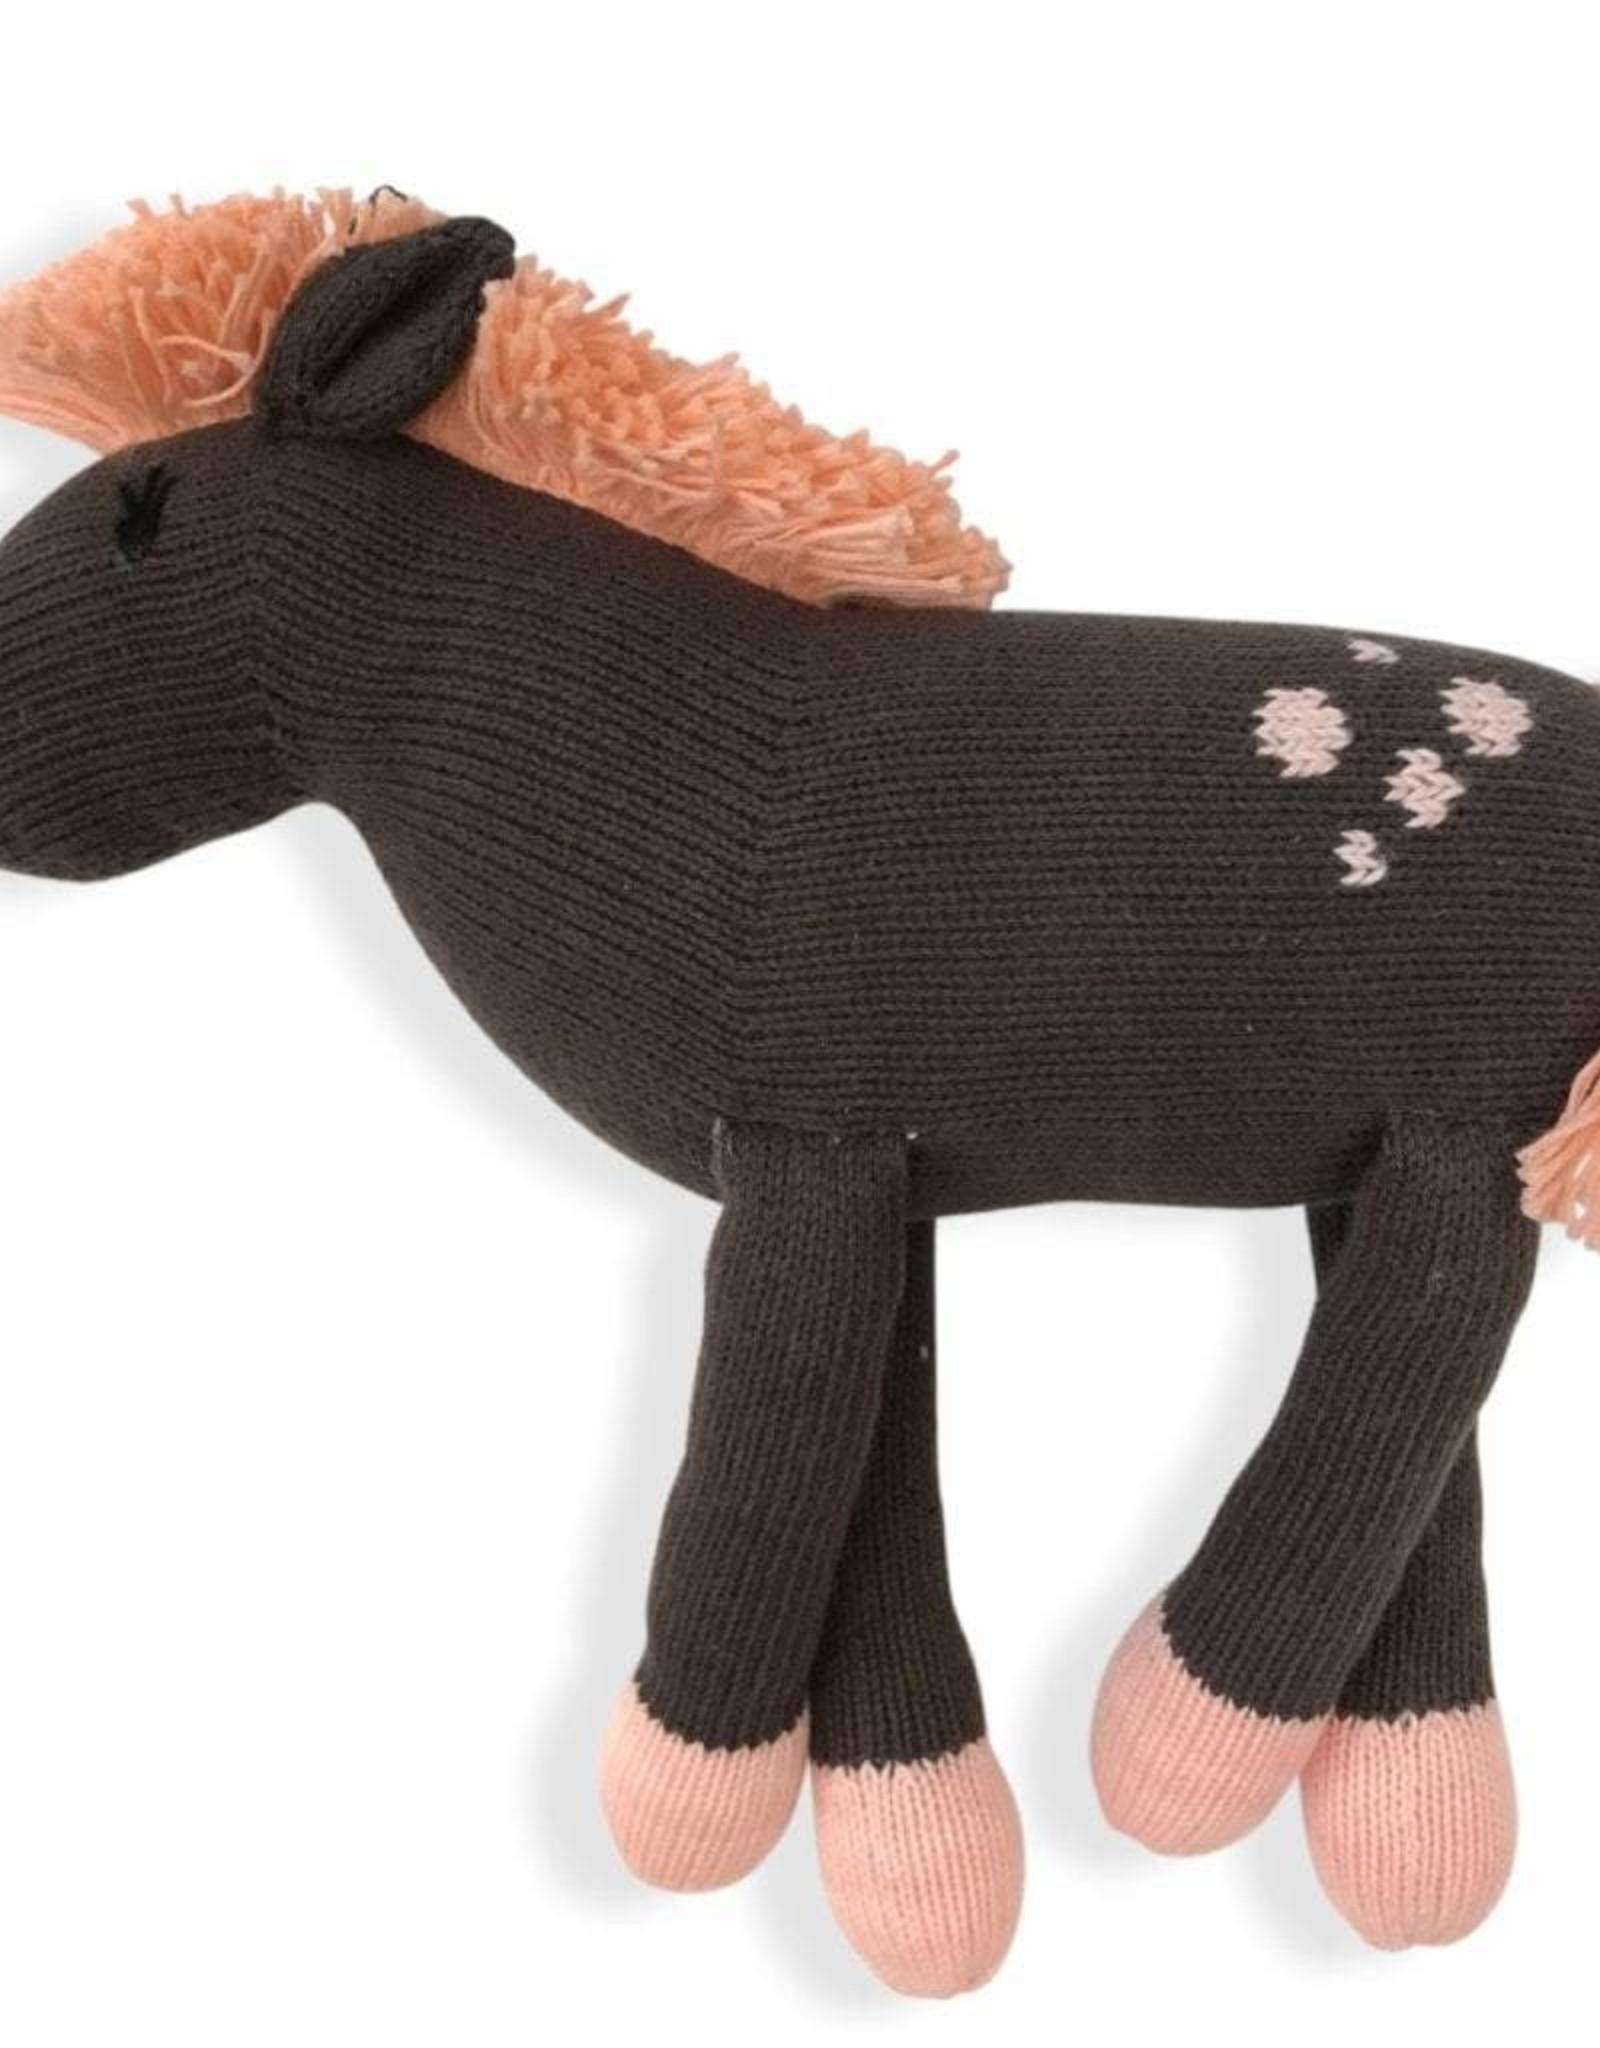 Finn + Emma Rattle Buddy Molly the Horse